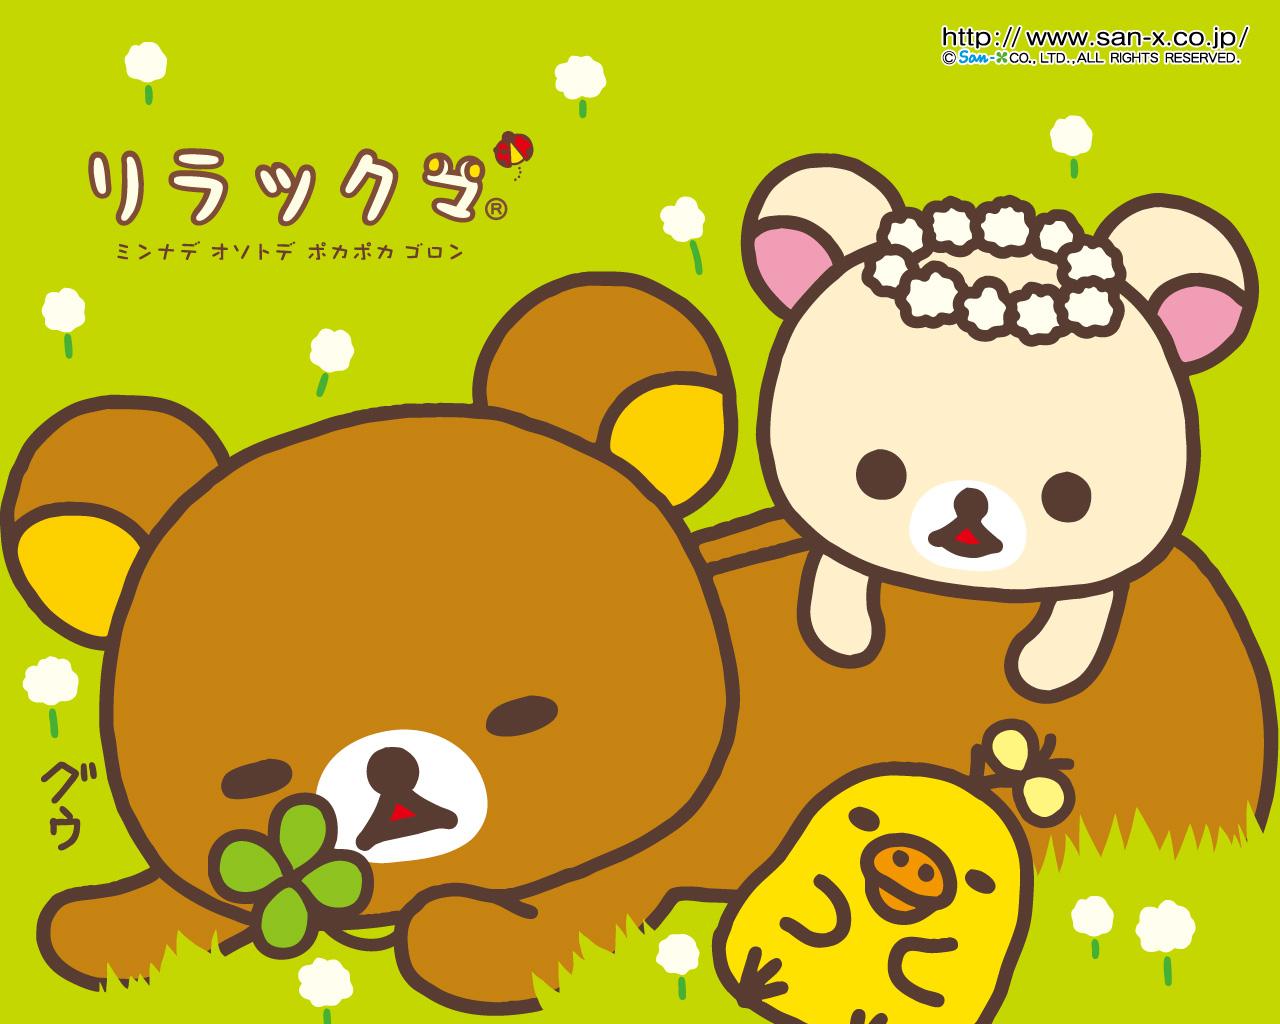 Fantastic Wallpaper Hello Kitty Bear - 16_1280_1024  Snapshot_69932.jpg